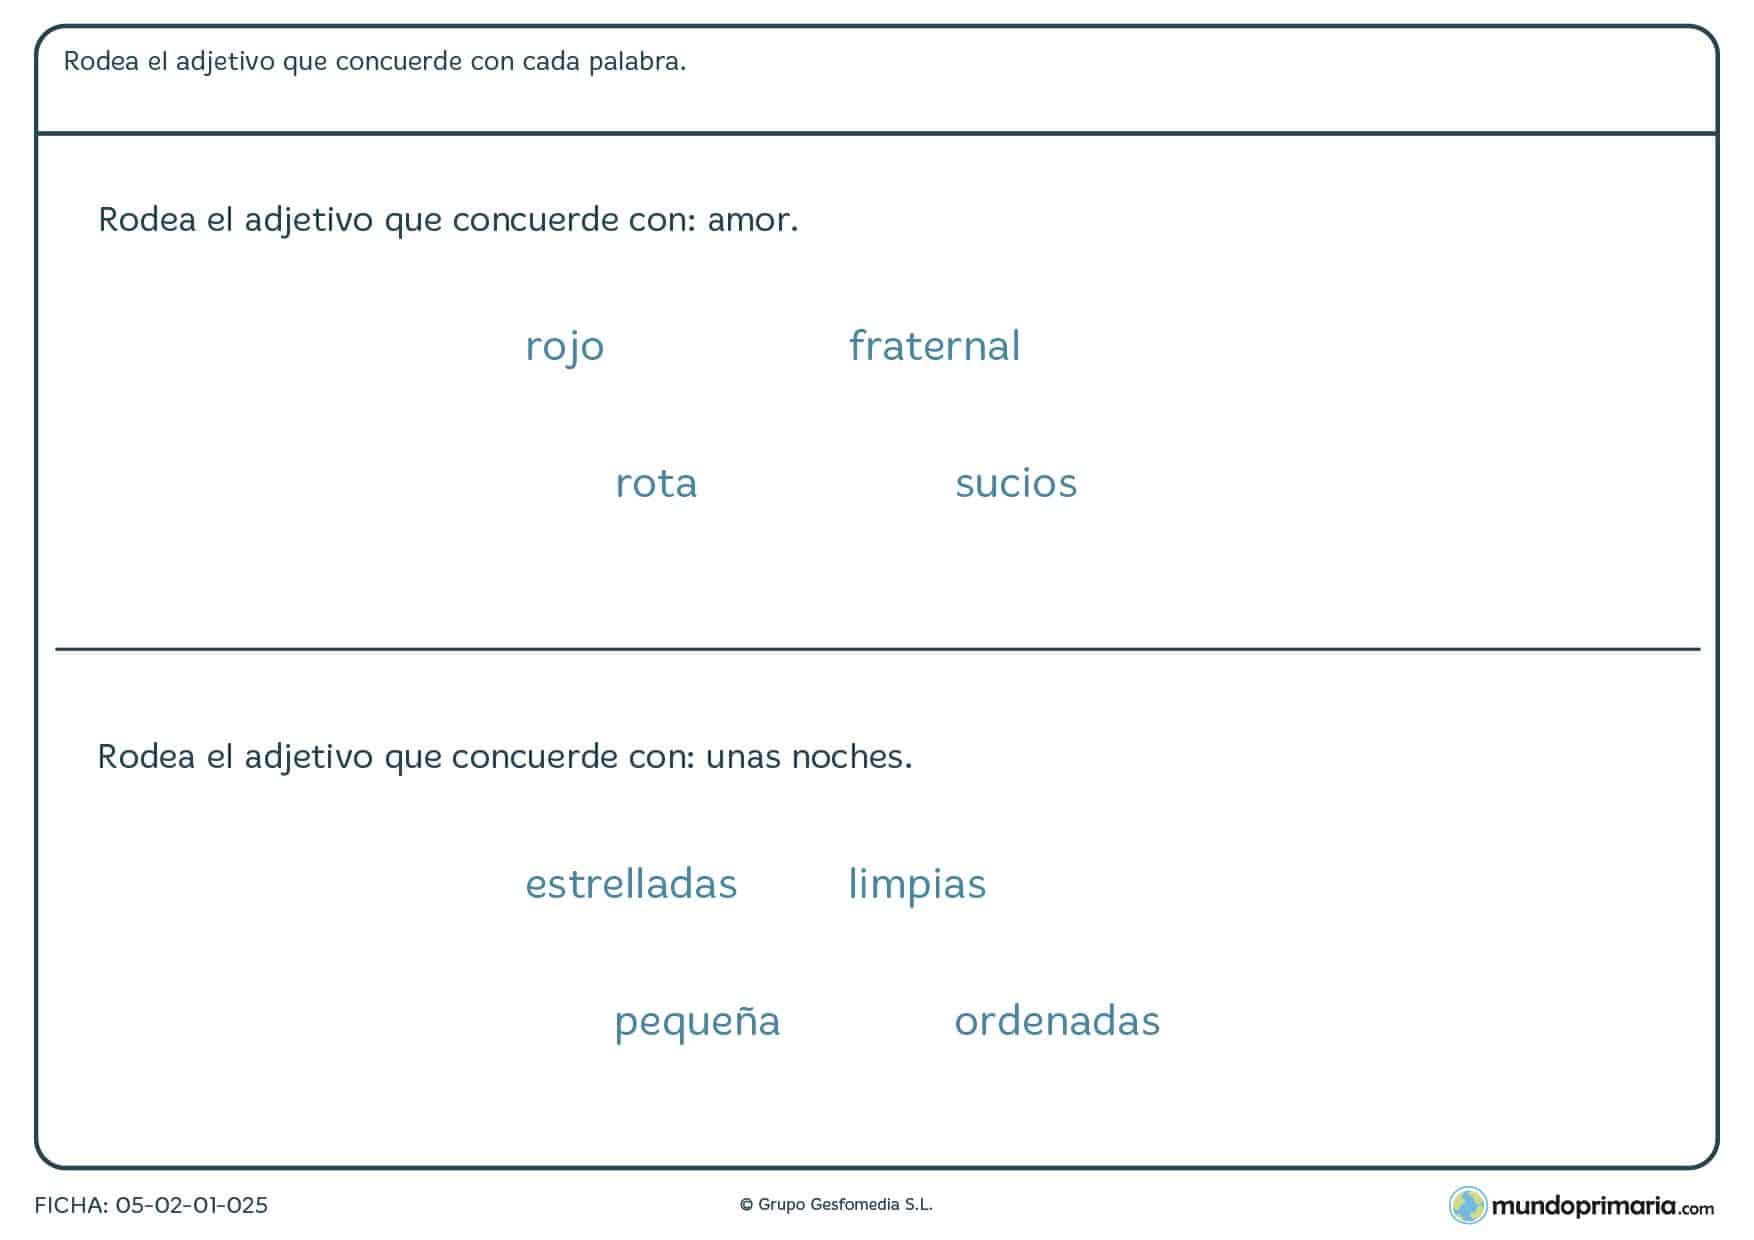 Ficha de lenguaje de gramática de adjetivos para alumnos de Primaria